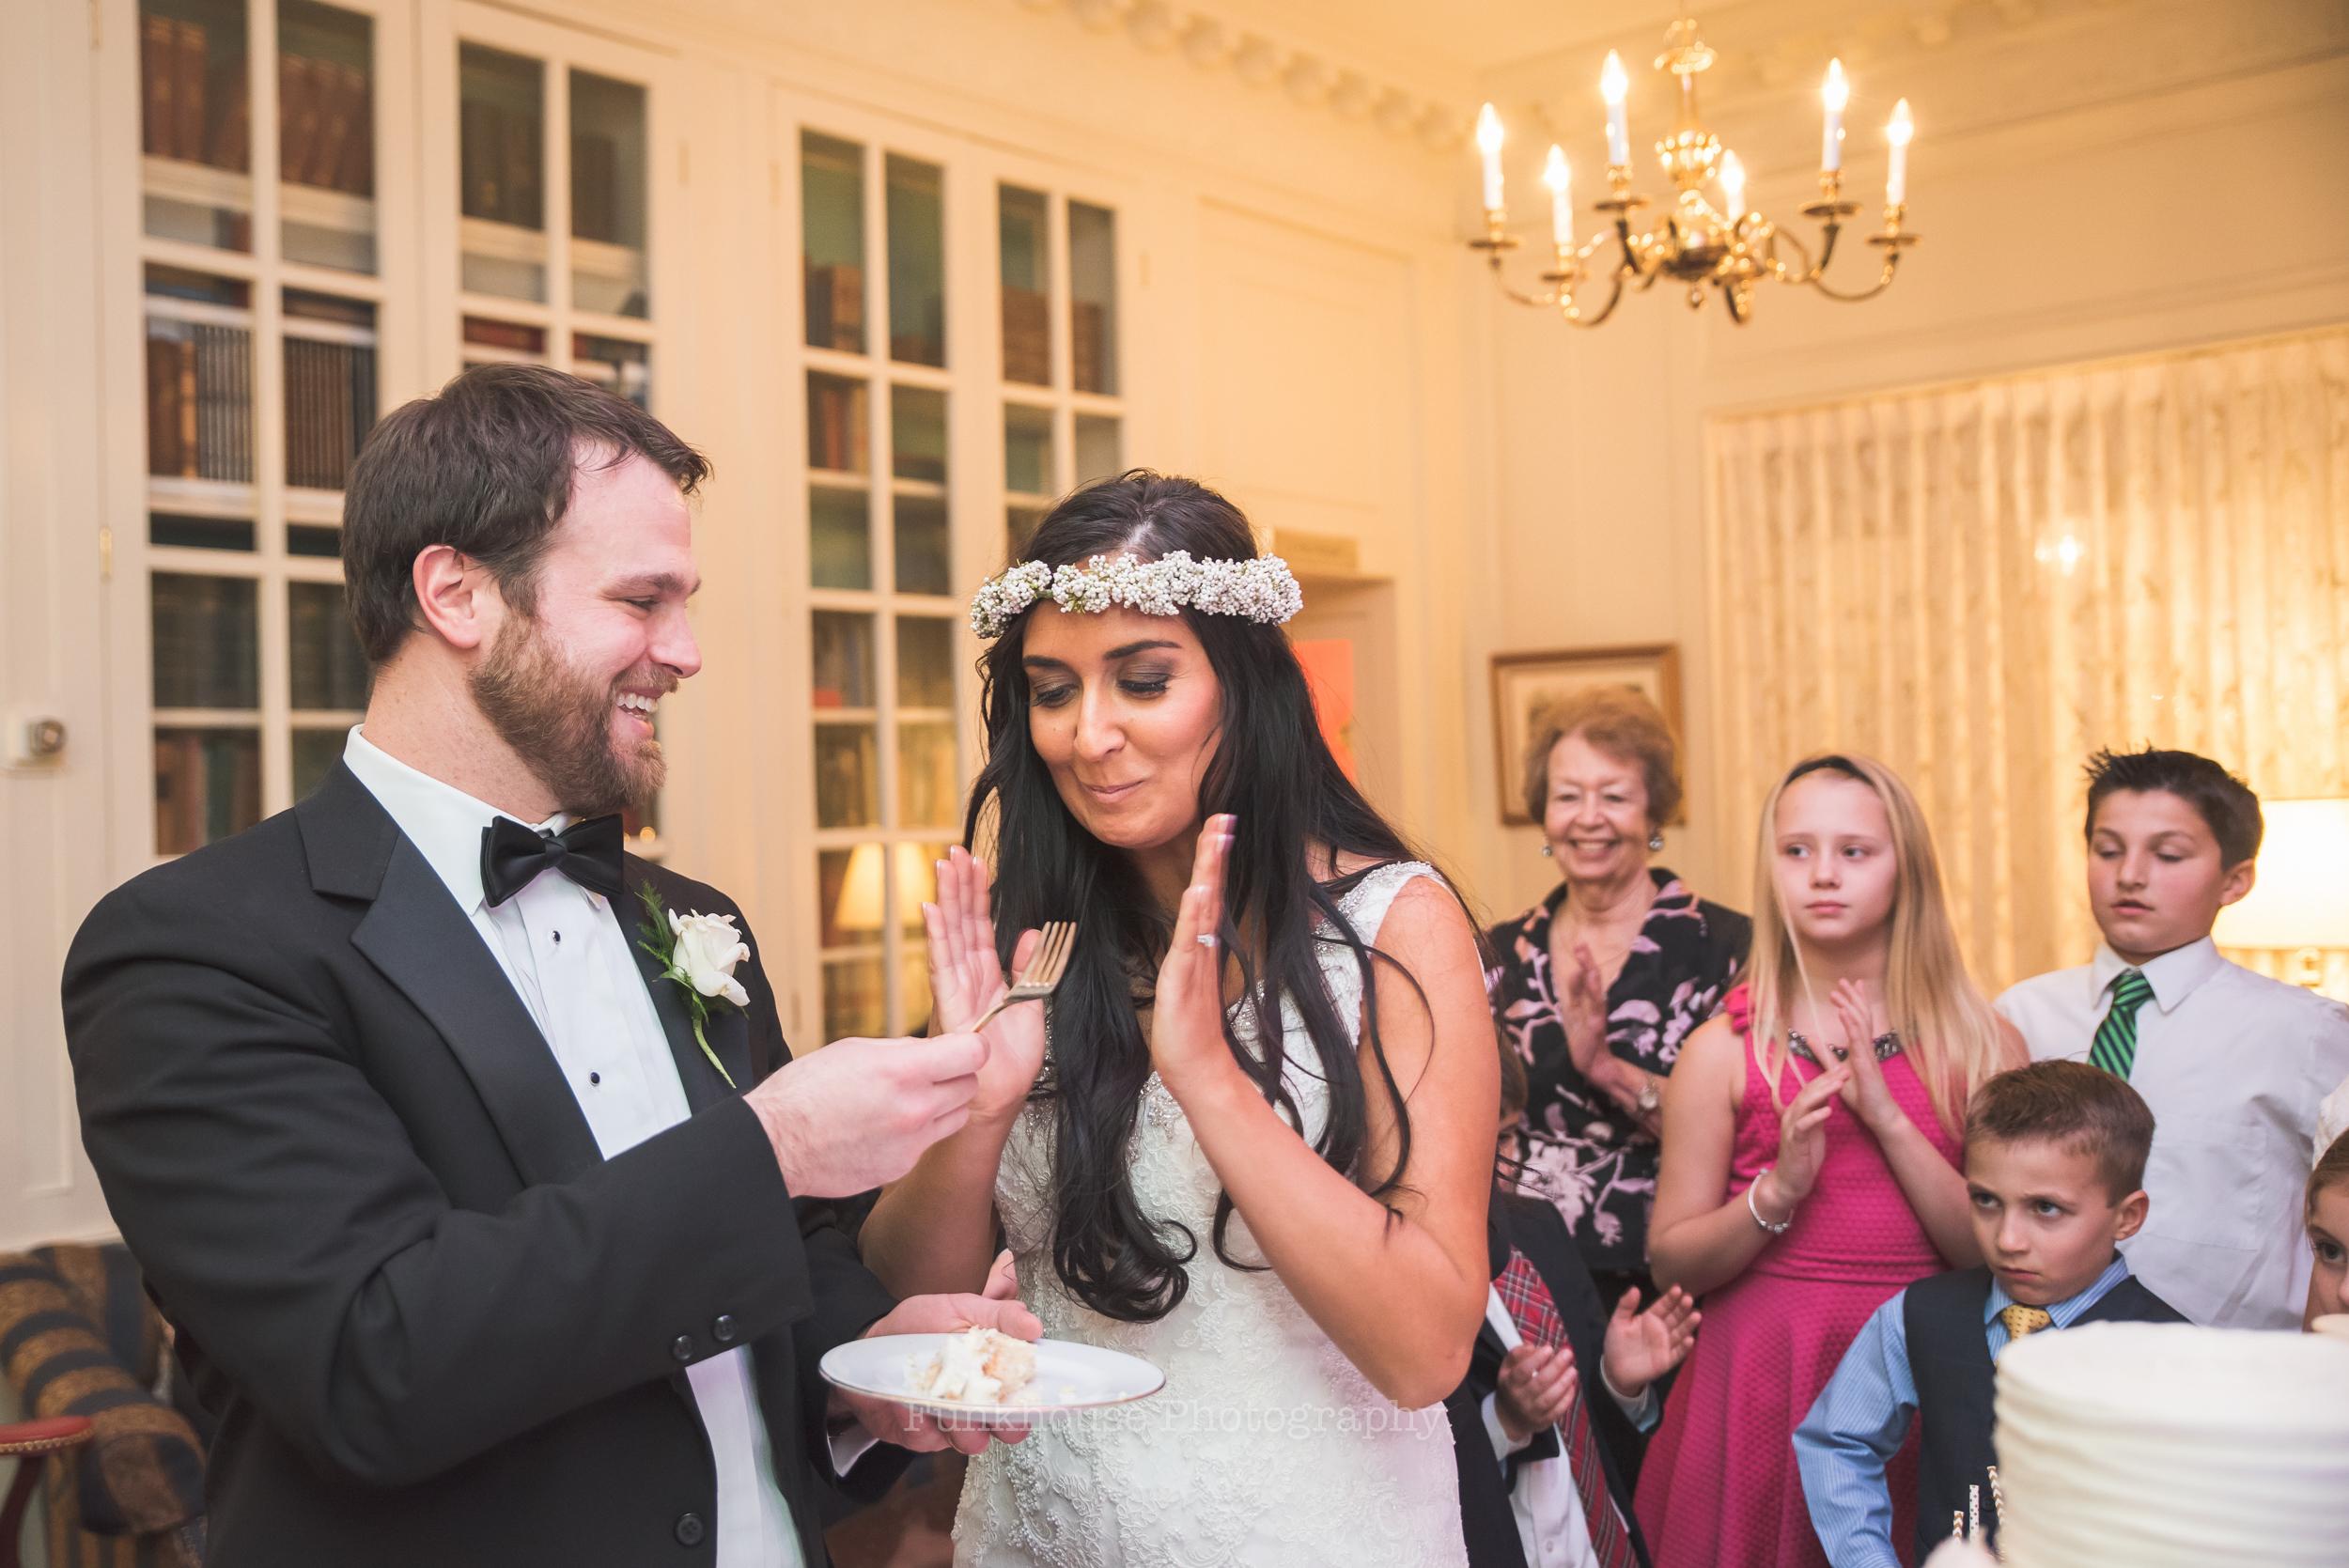 rockville-MD-wedding-cake-photos.jpg